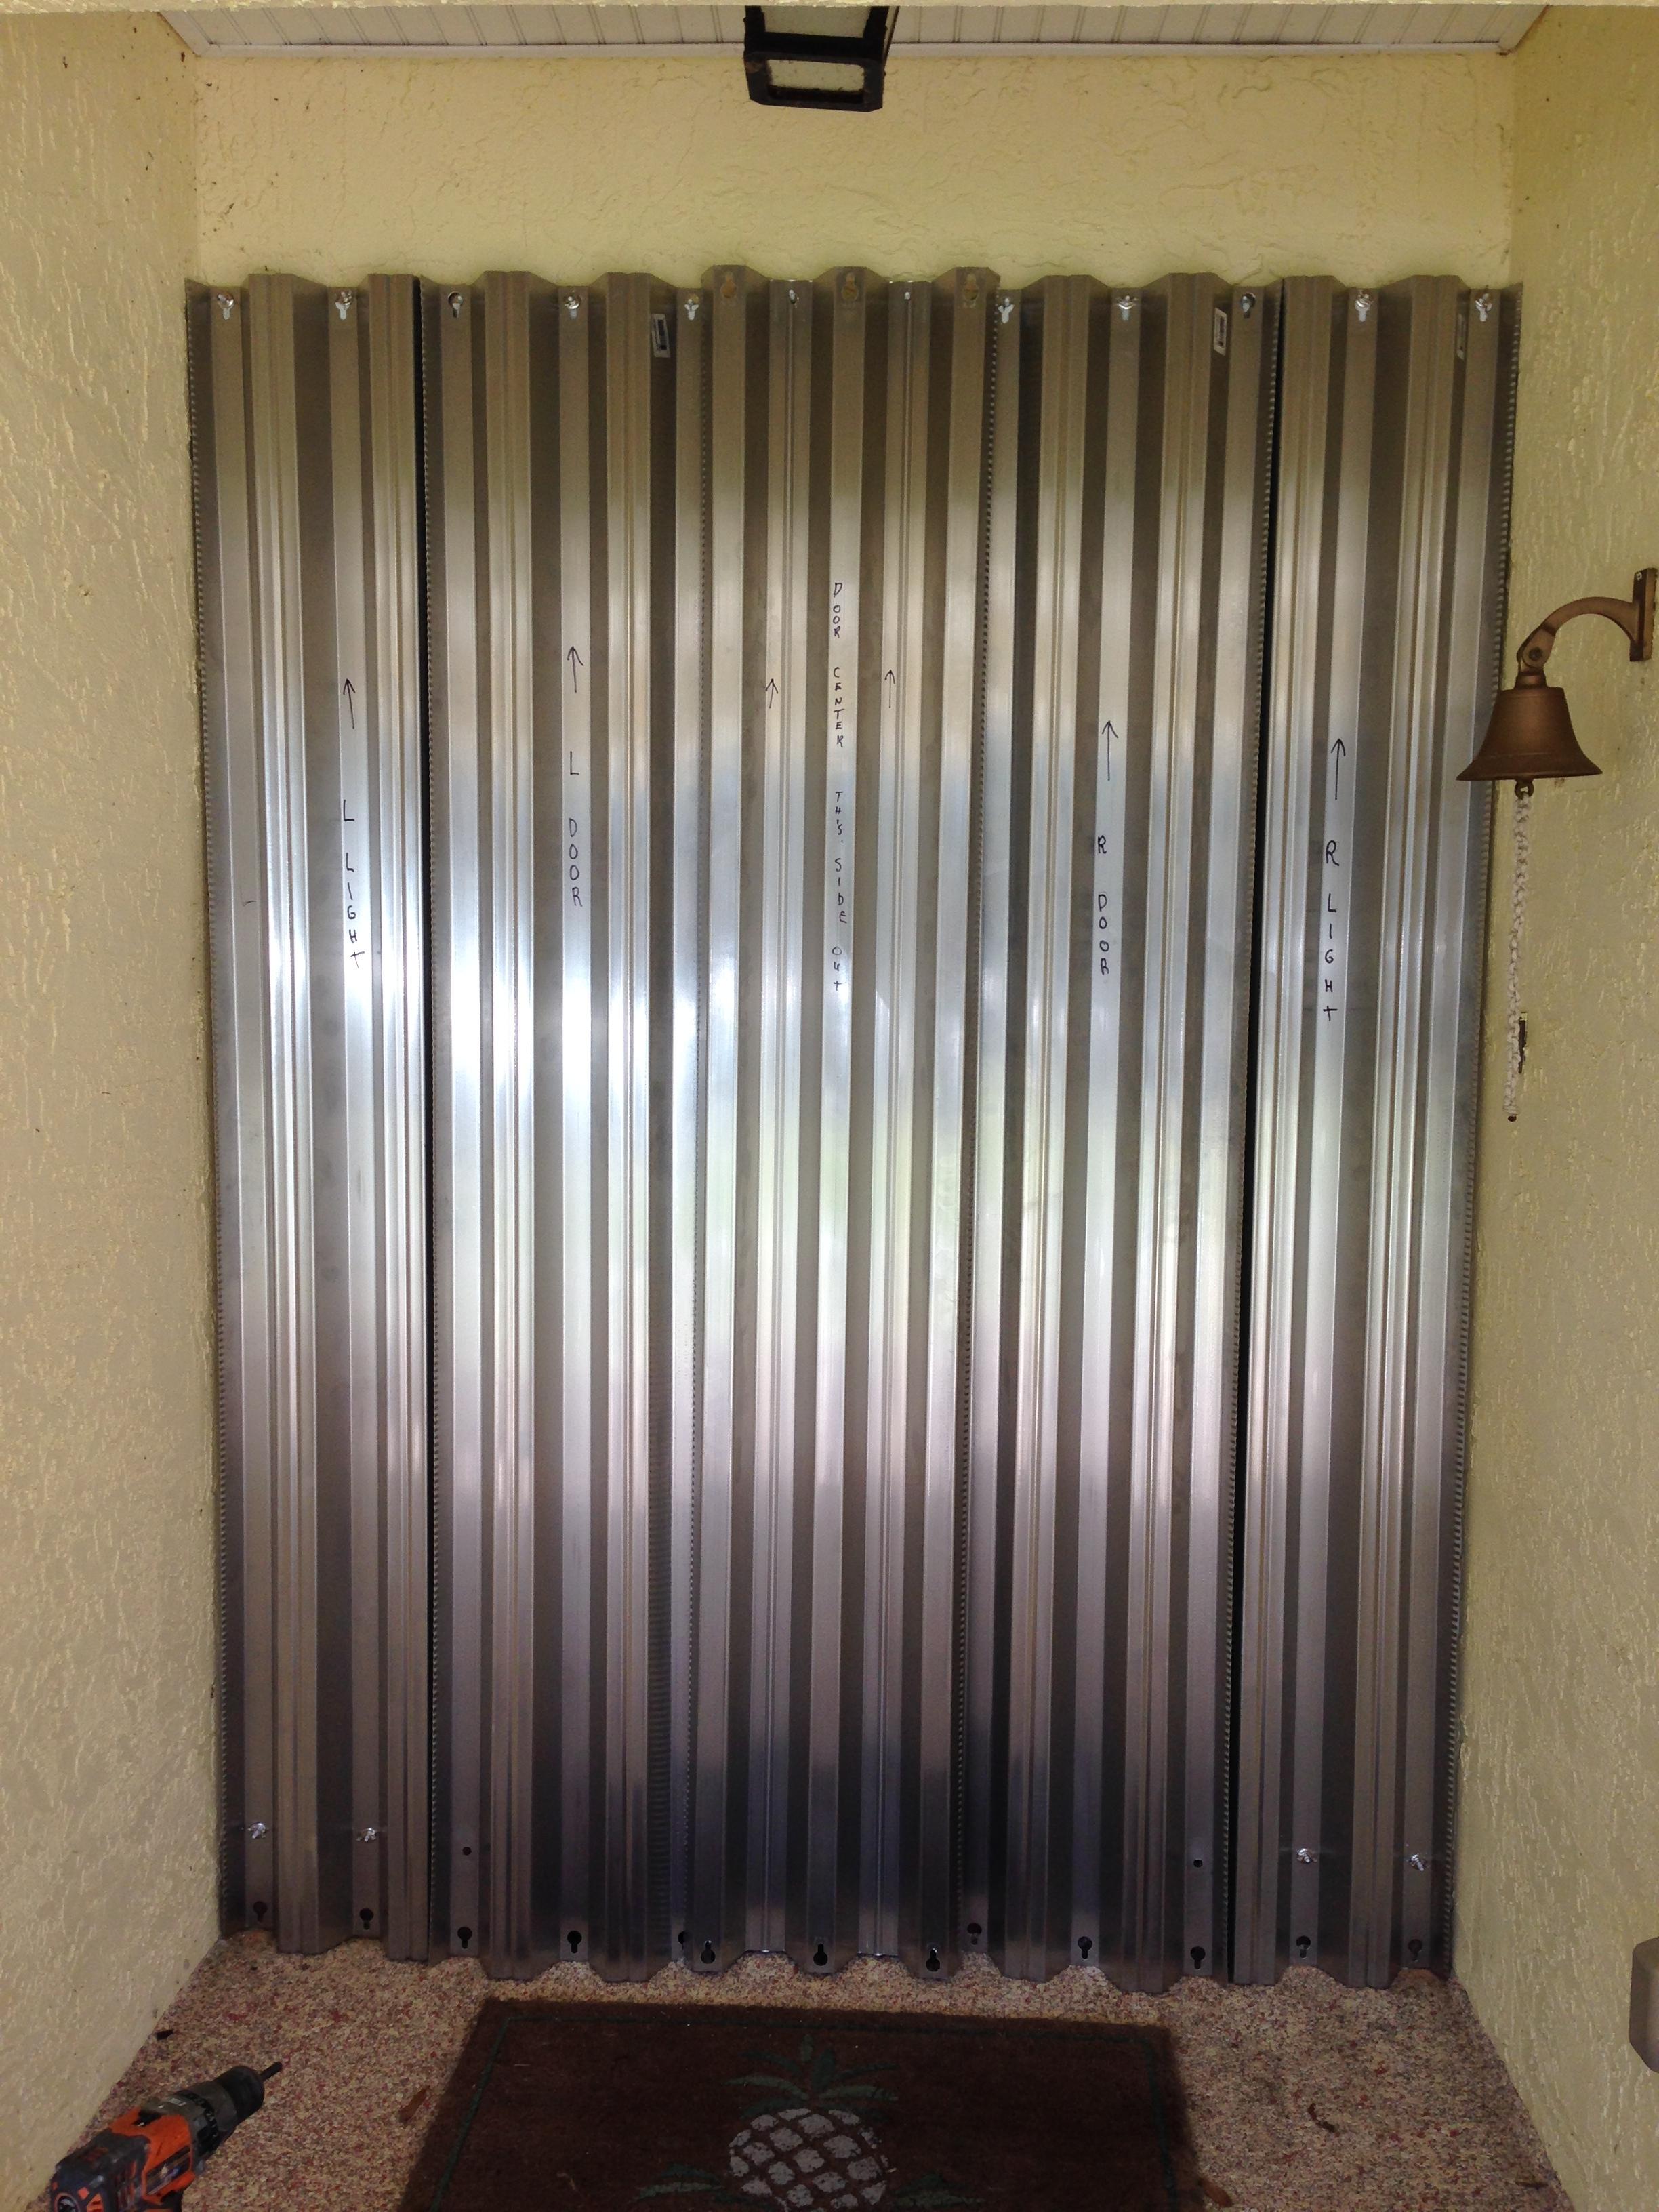 Hurricane Shutters Sliding Glass Doors2448 X 3264